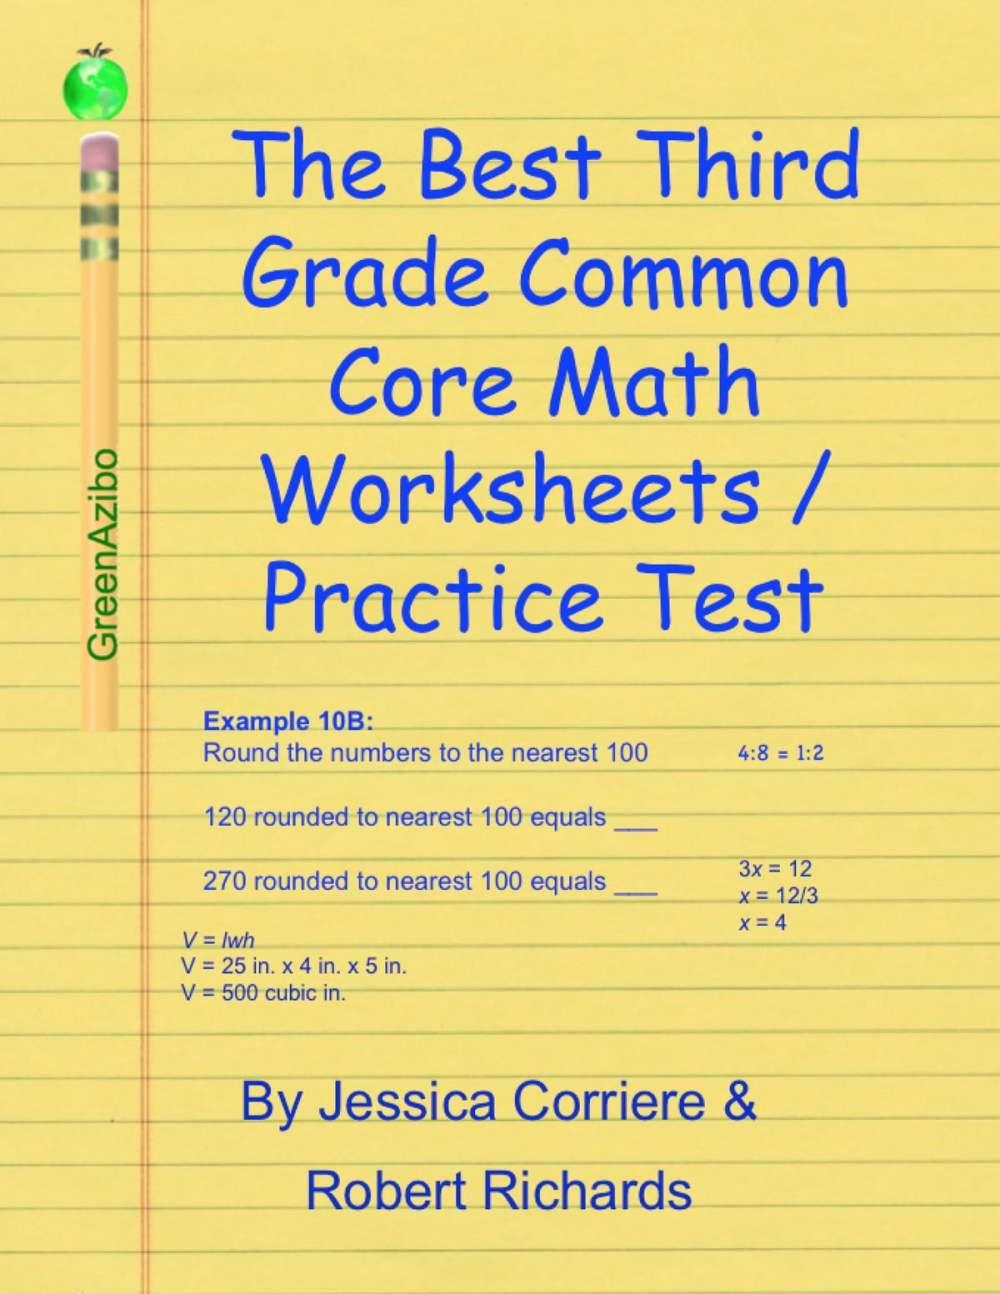 medium resolution of The Best Third Grade Common Core Math Worksheets / Practice Tests eBook by  Robert Richards - 9781312098305   Rakuten Kobo United States